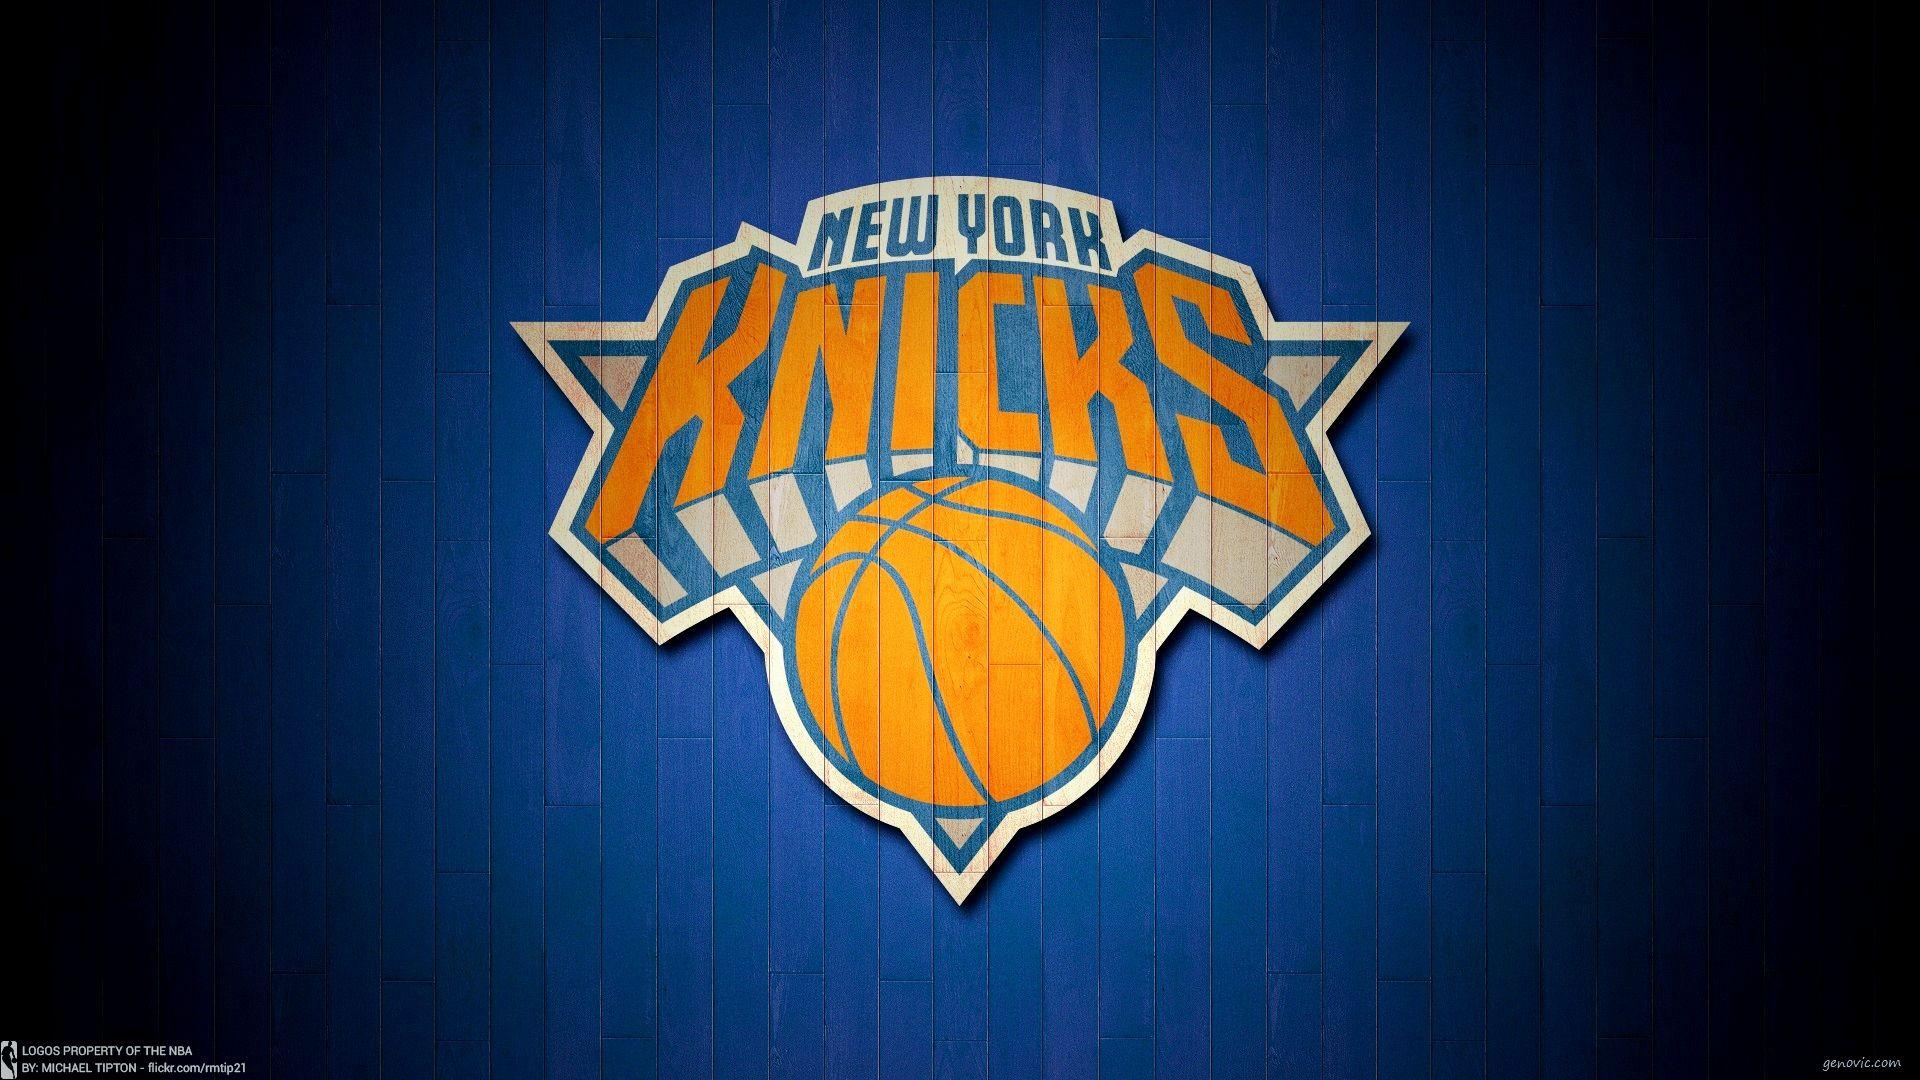 Cleveland Cavaliers Logo >> Nba Team Logos Wallpaper 2015 - WallpaperSafari